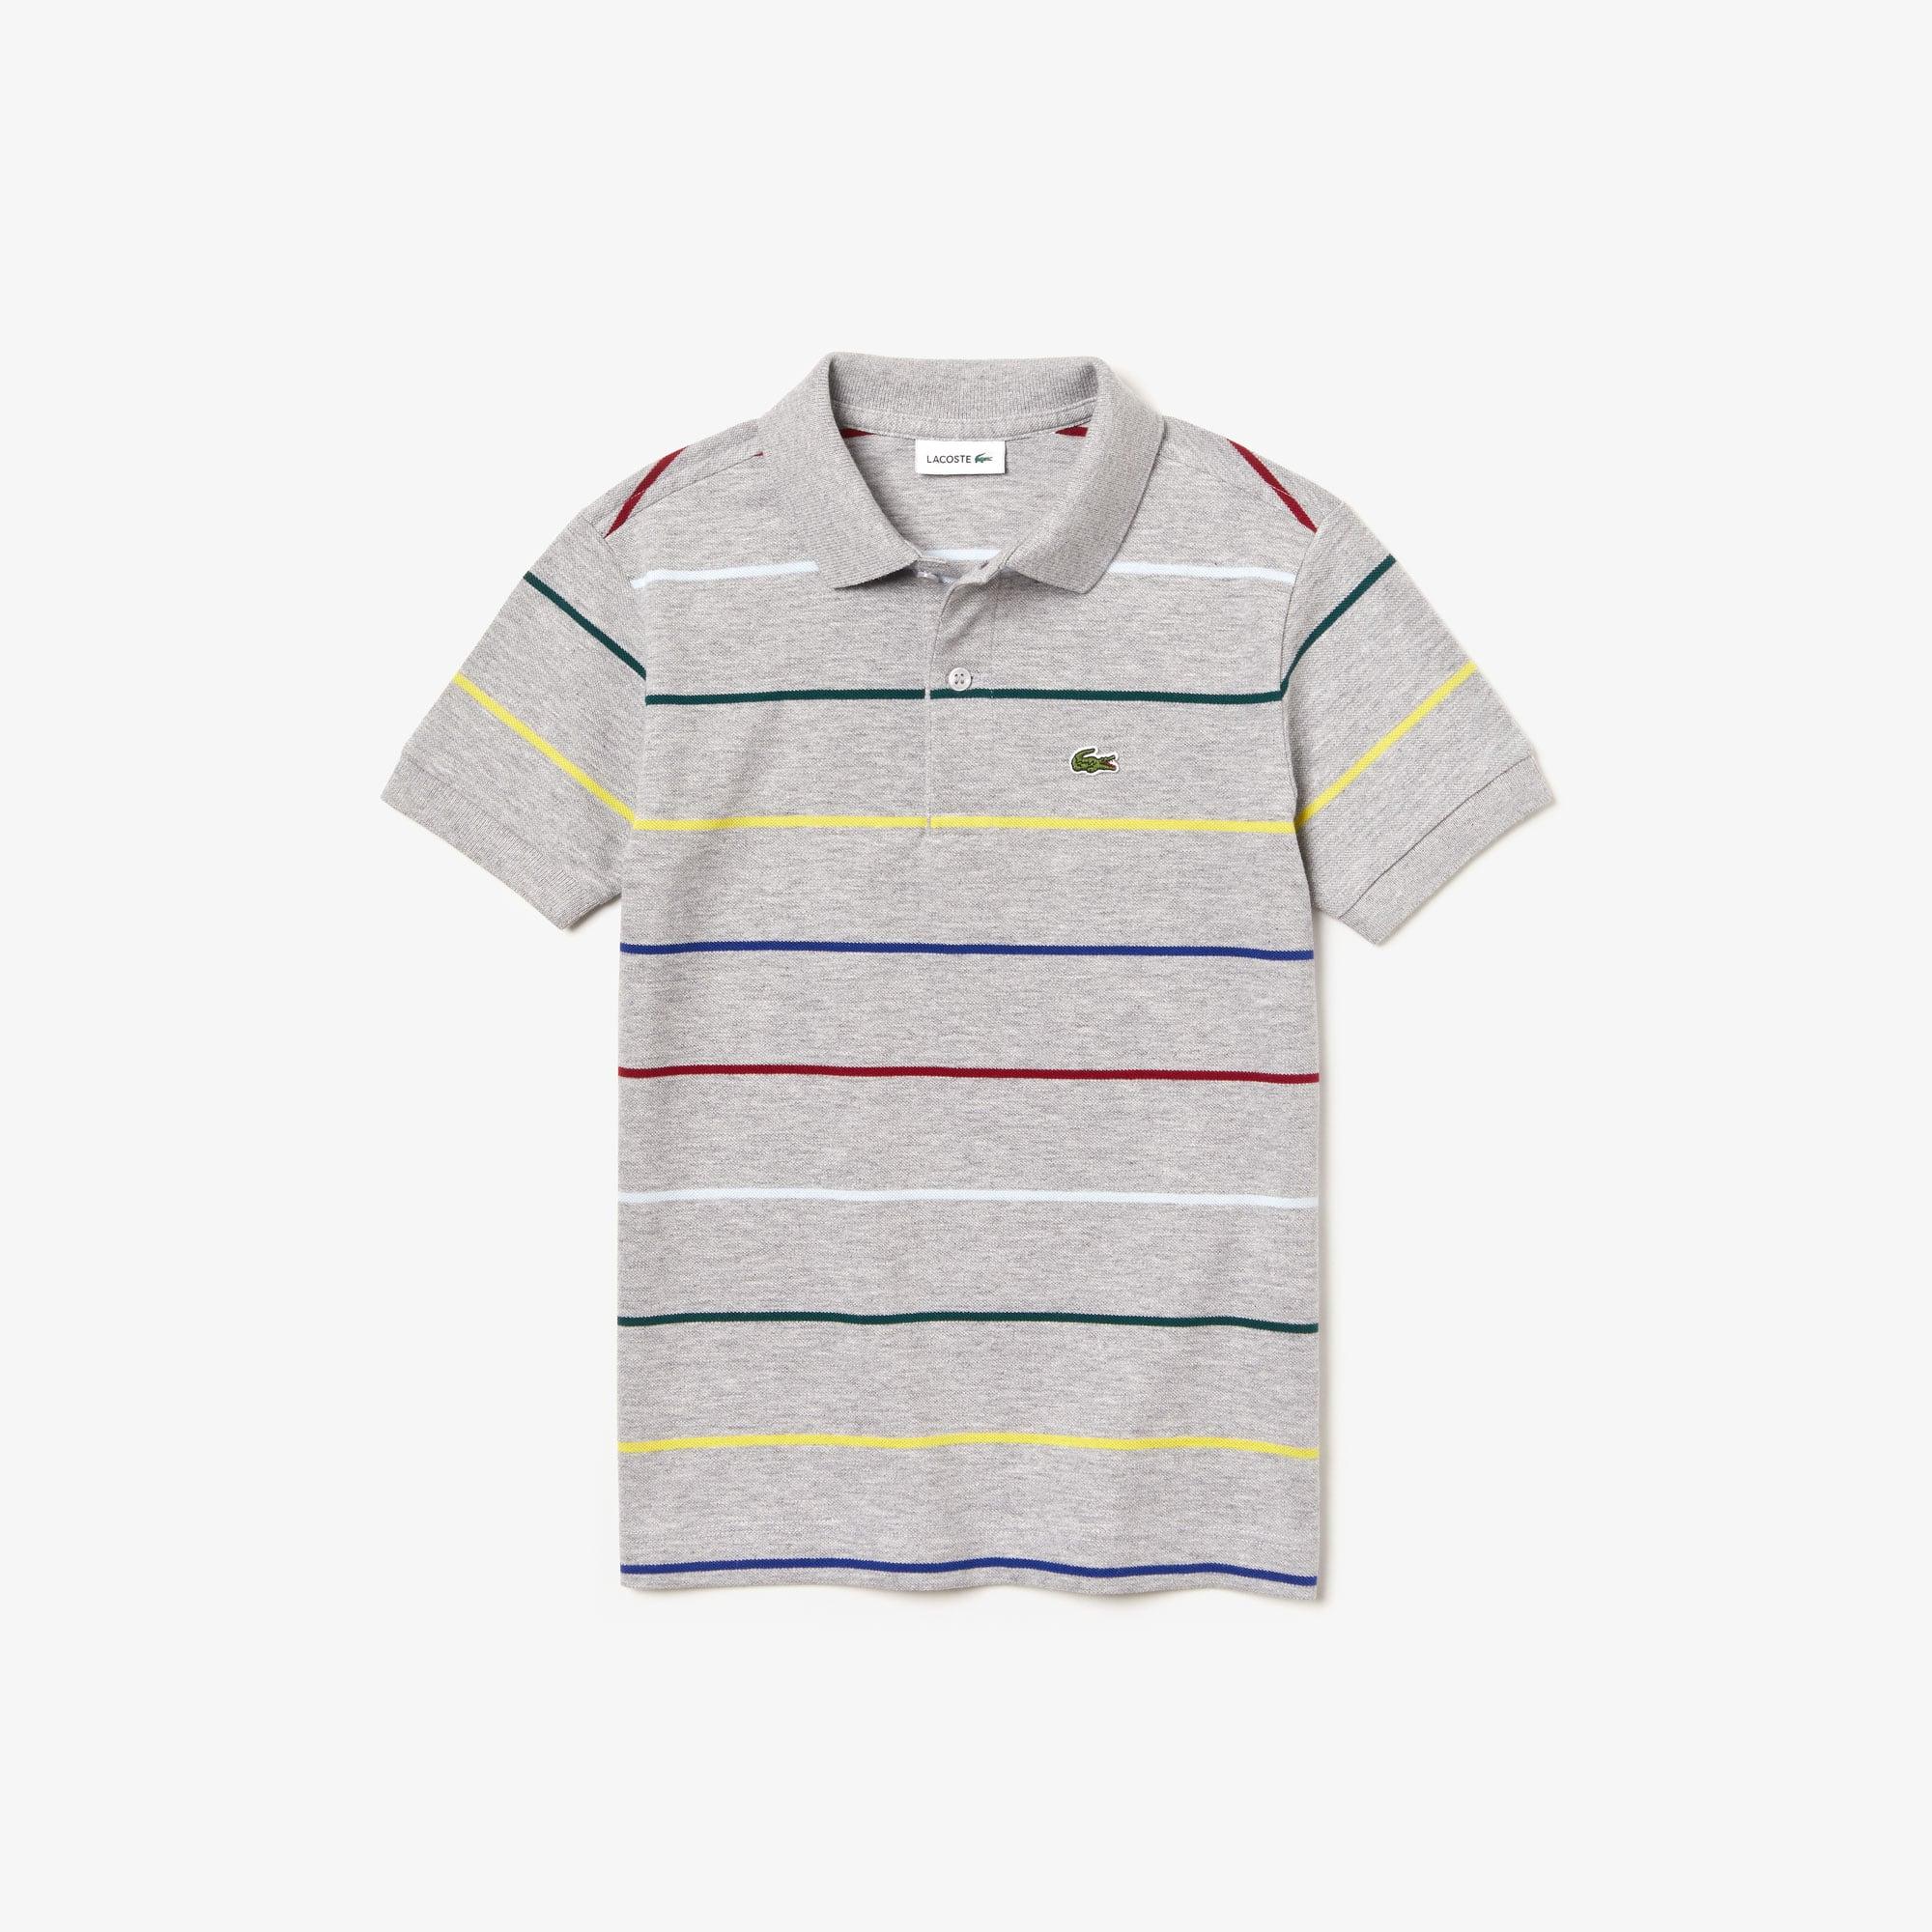 f412f209 Boys' Lacoste Coloured Pinstripes Cotton Piqué Polo Shirt   LACOSTE